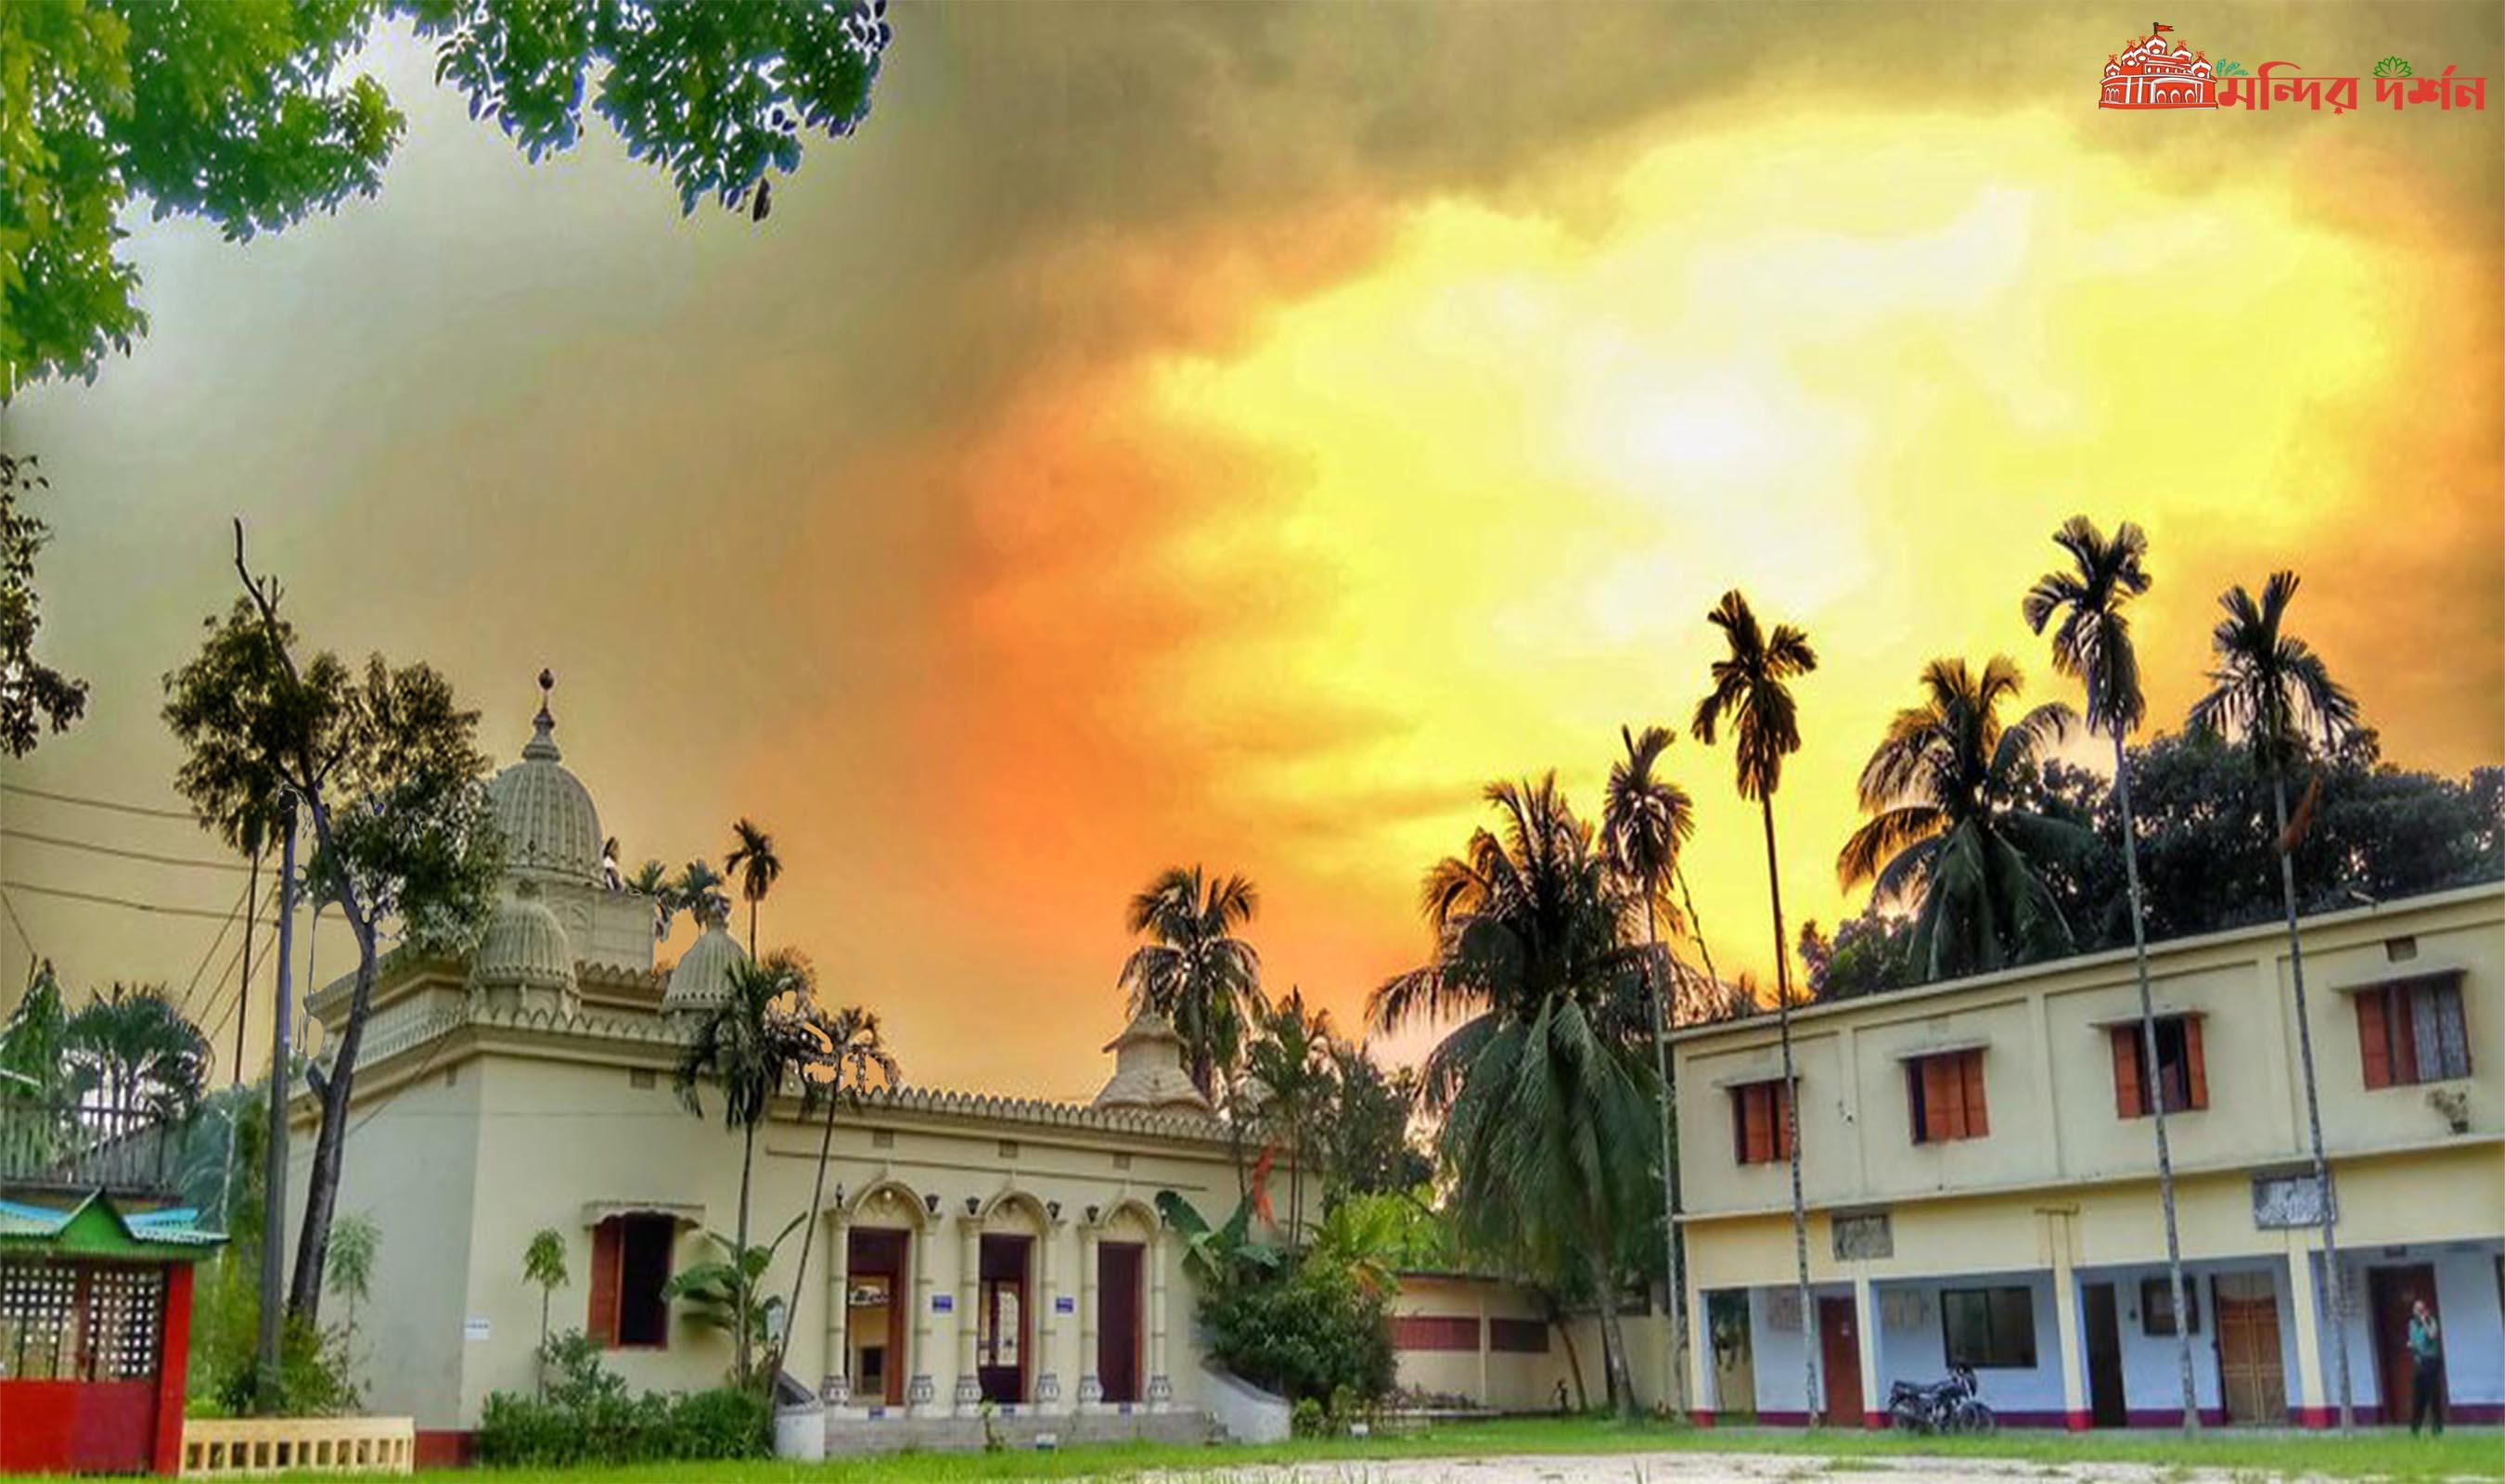 barisal ramkrishna mission